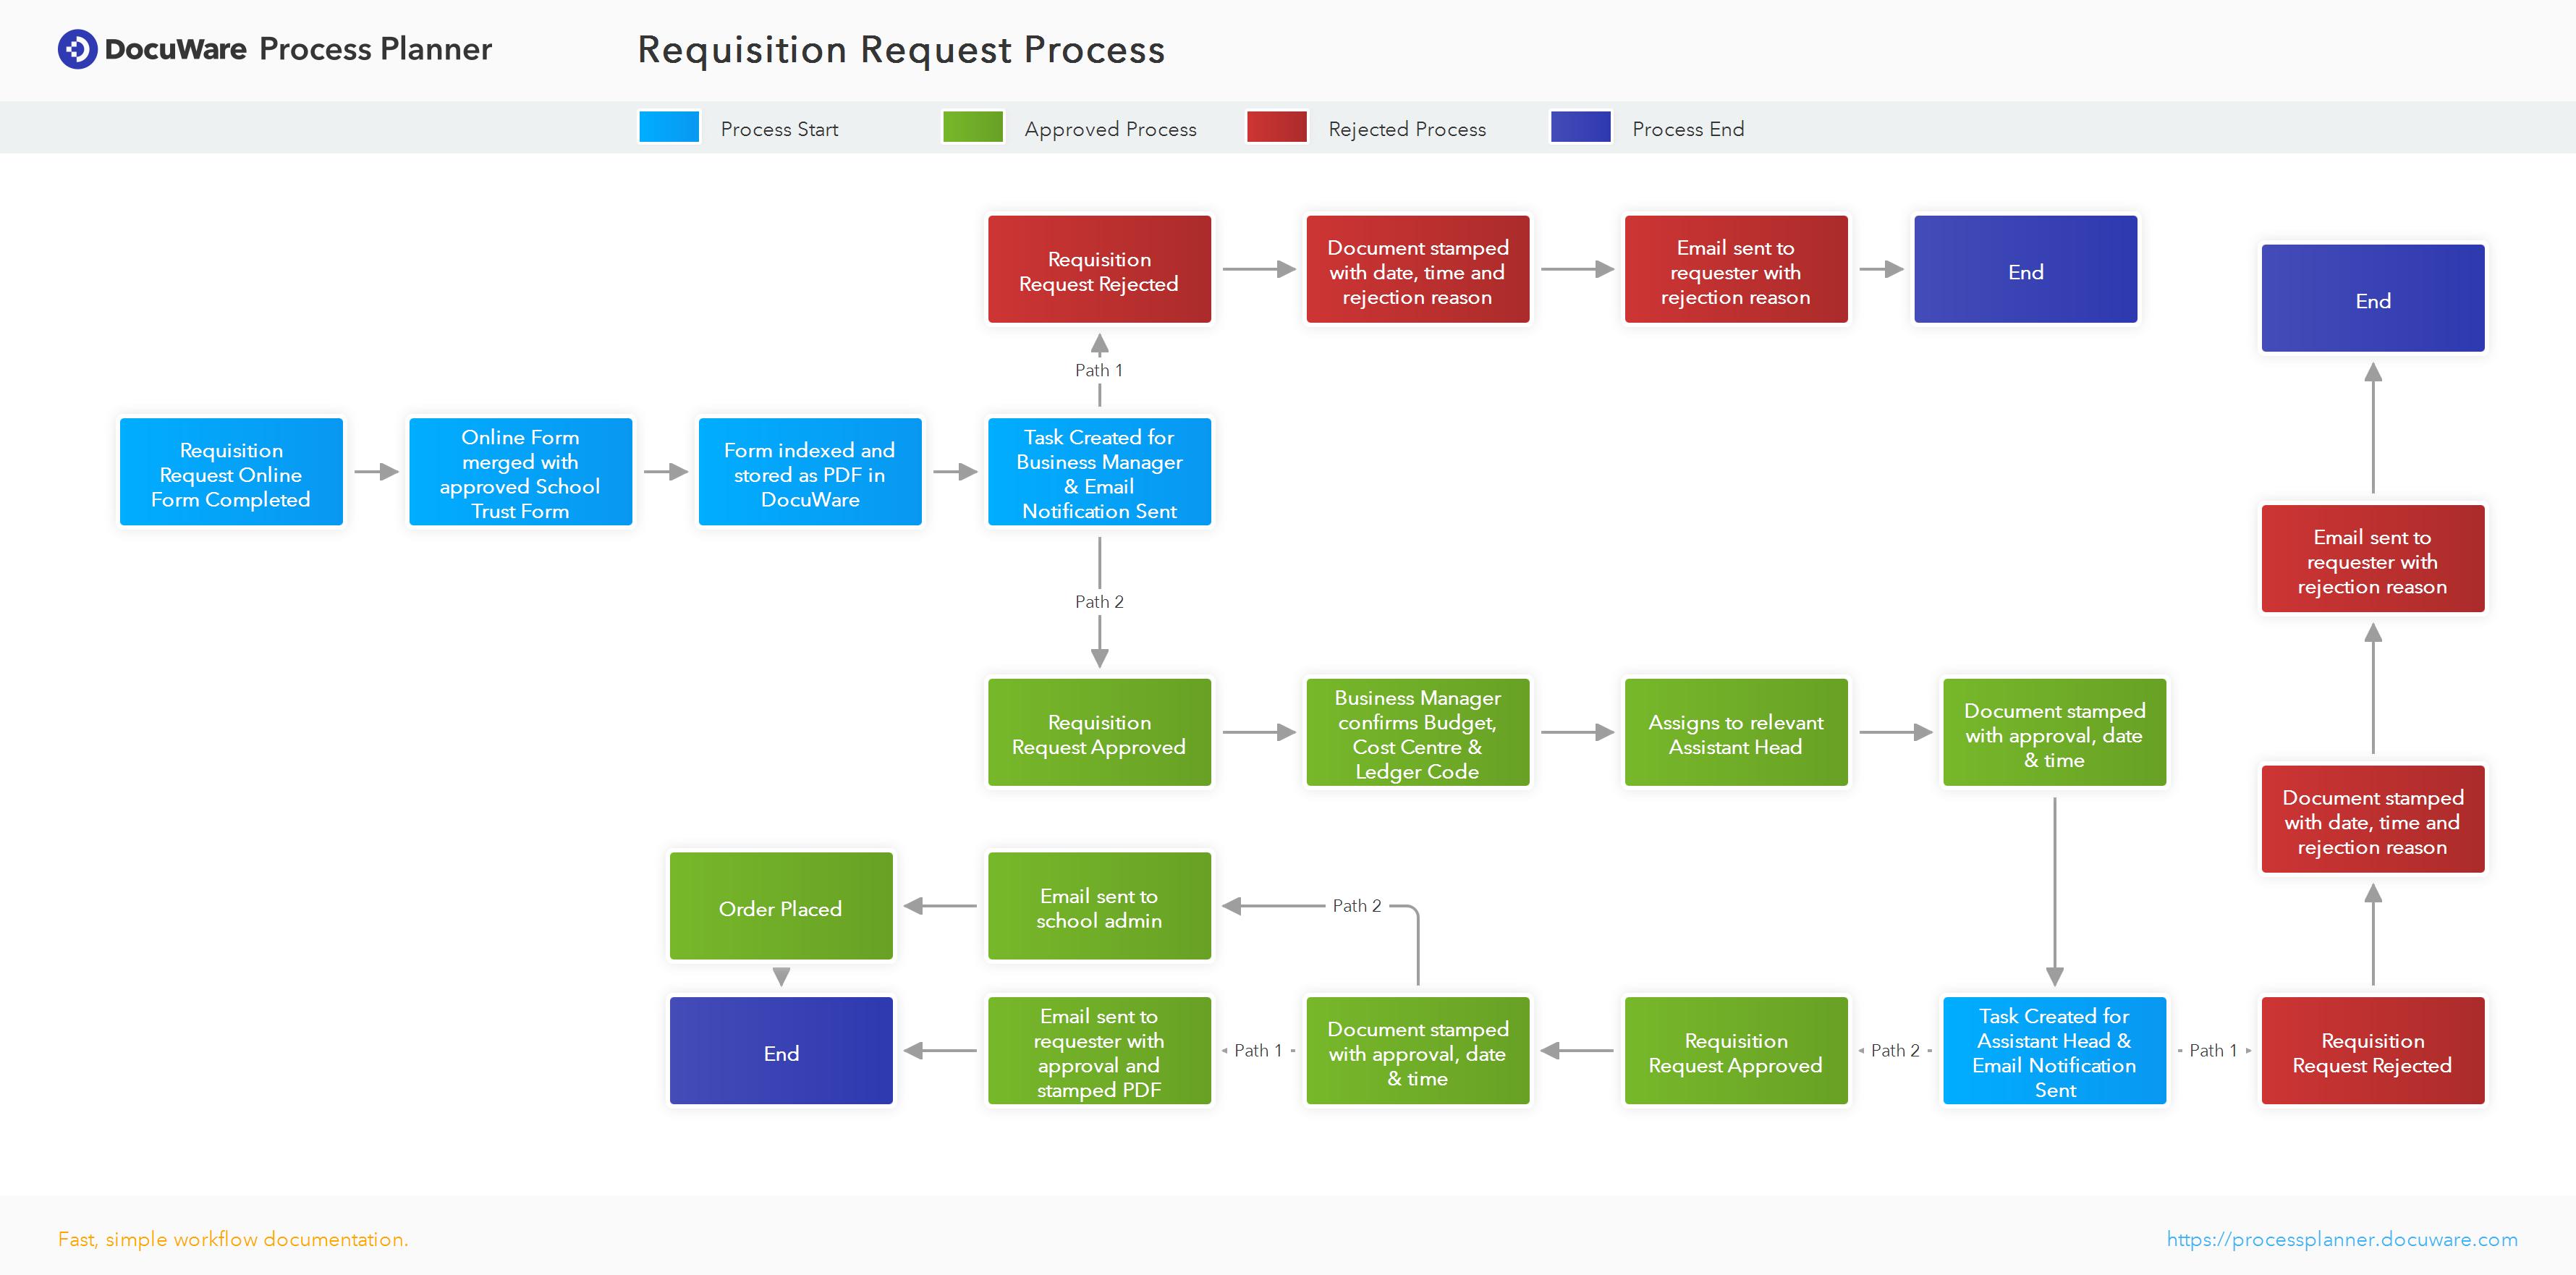 Requisition Request Process